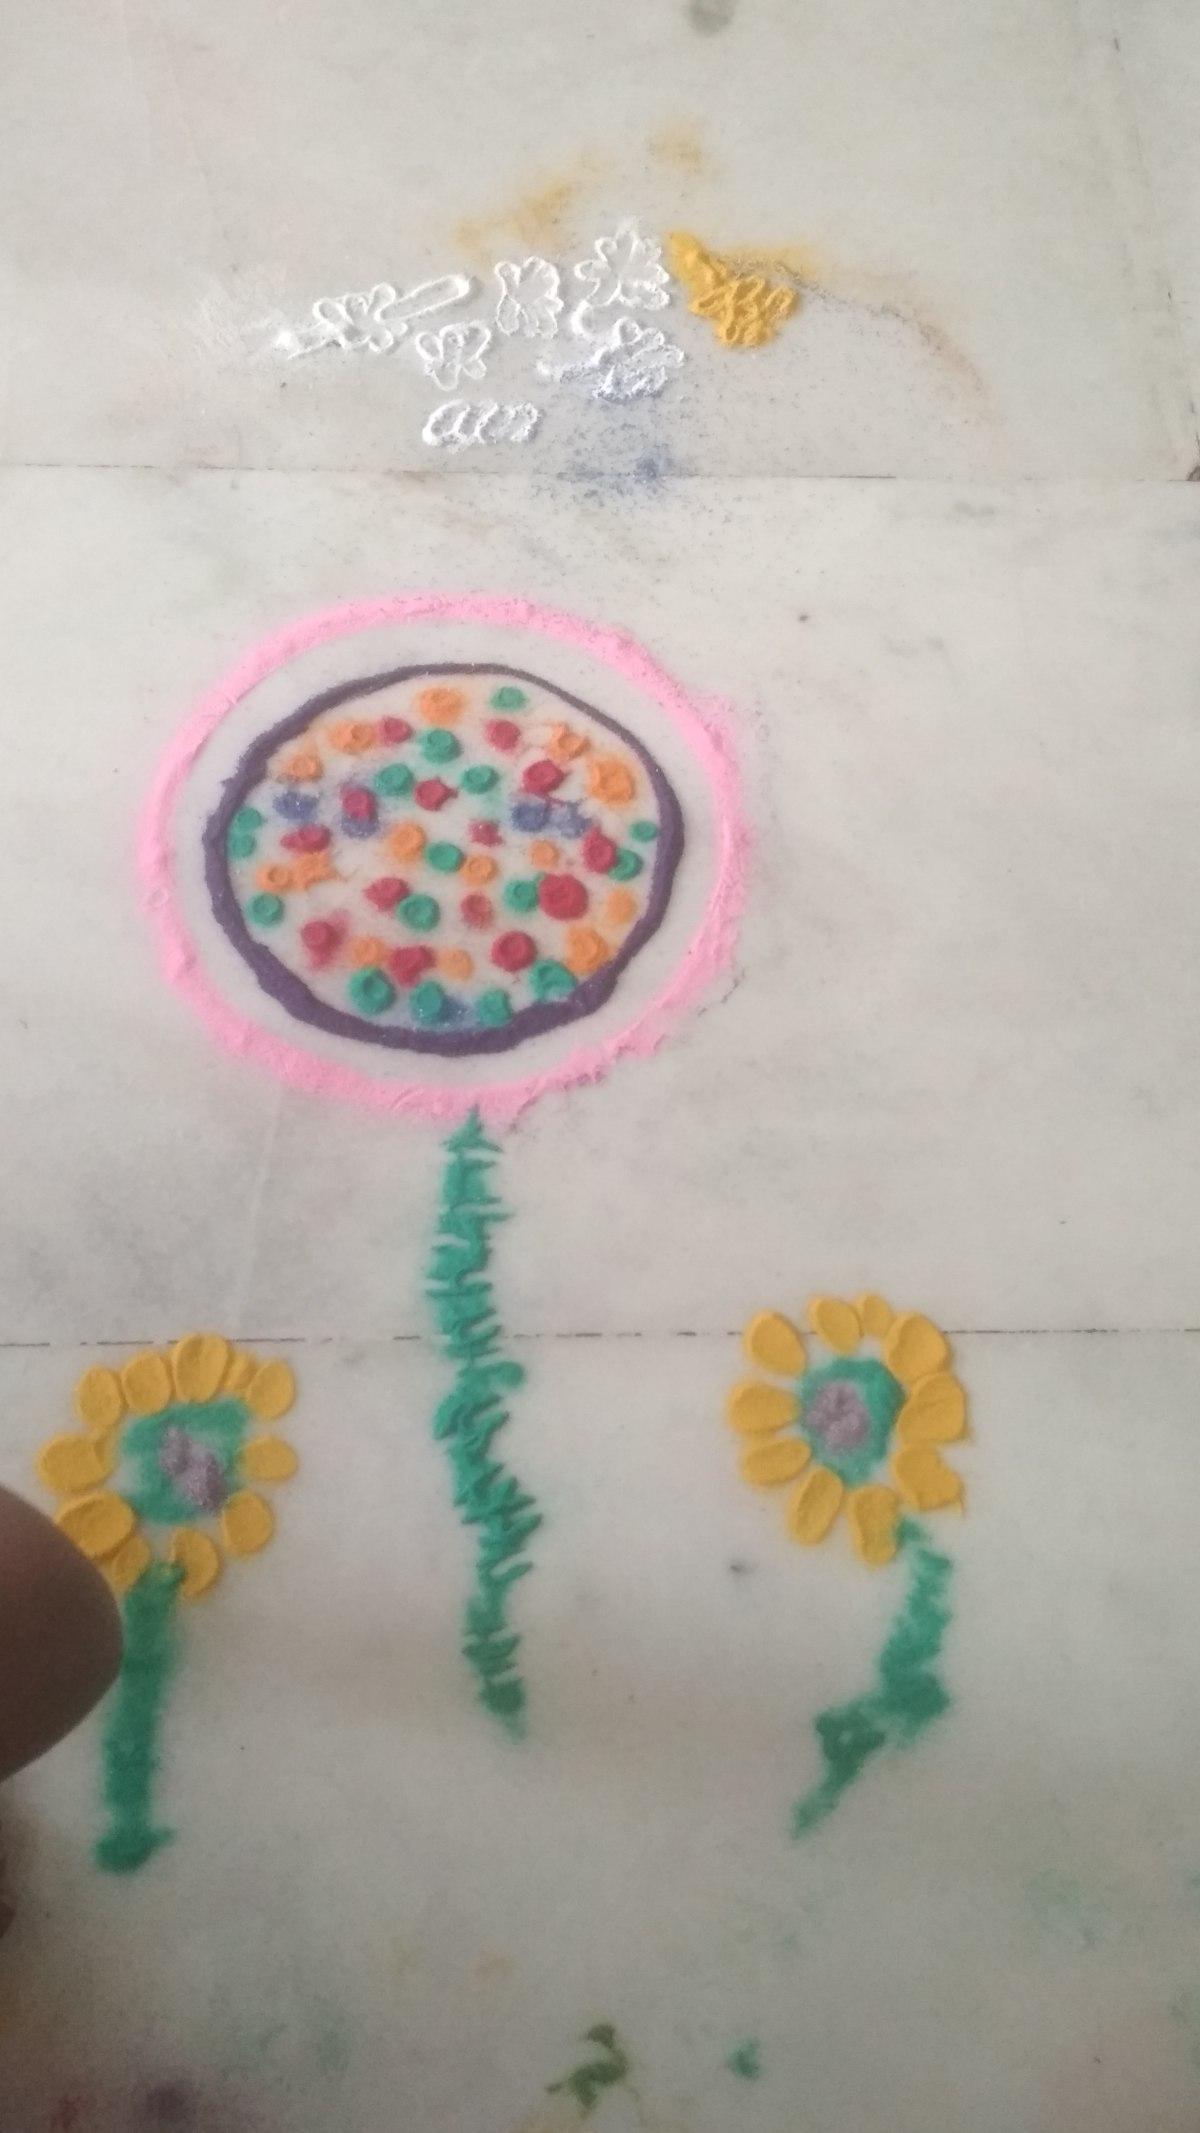 Rangoli Making With Kids: Fun and Learning